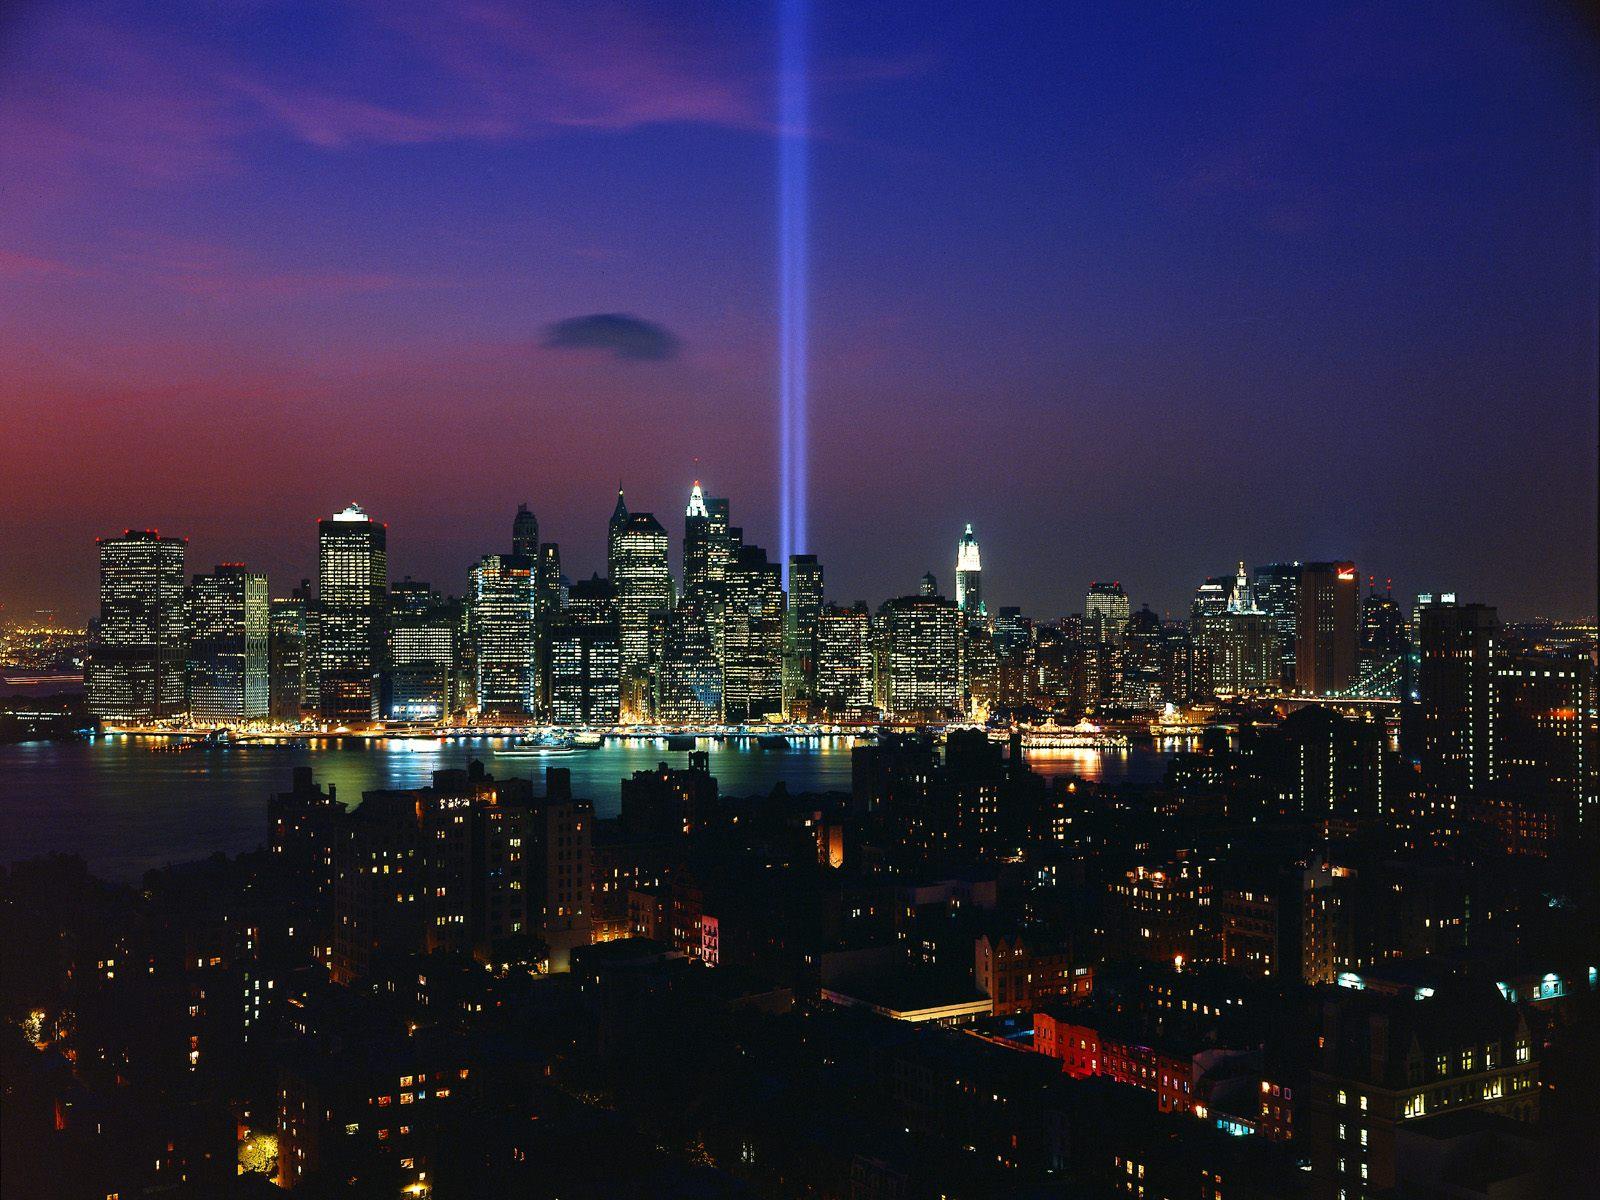 9.11.1